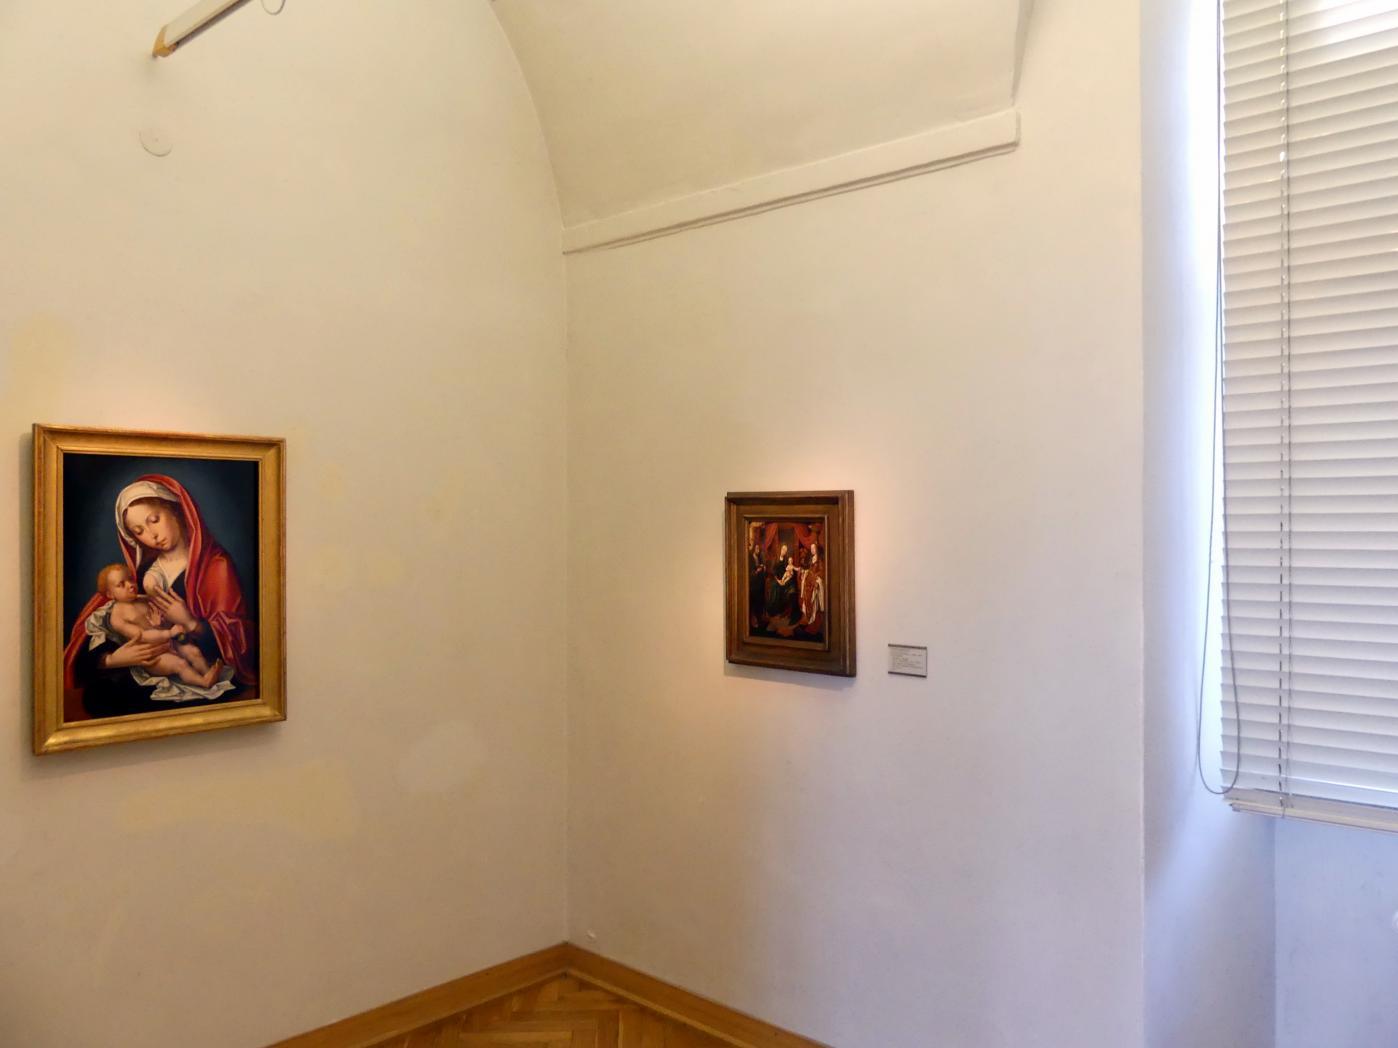 Prag, Nationalgalerie im Palais Sternberg, 1. Obergeschoss, Saal 9, Bild 2/4